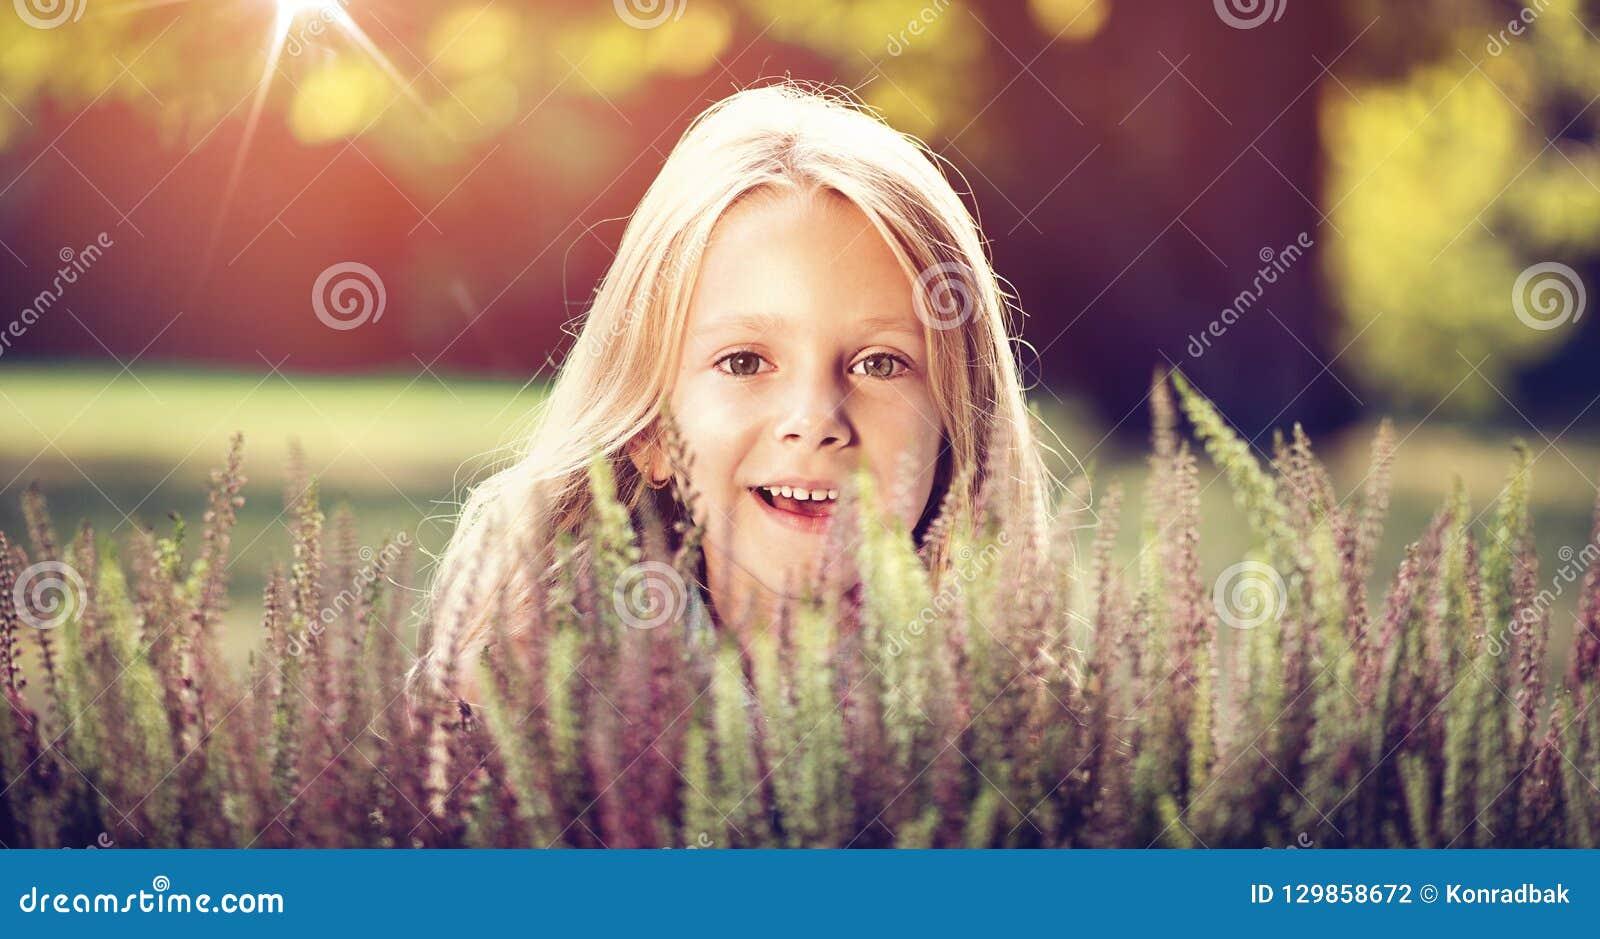 Cute little girl hiding behind heather flowers